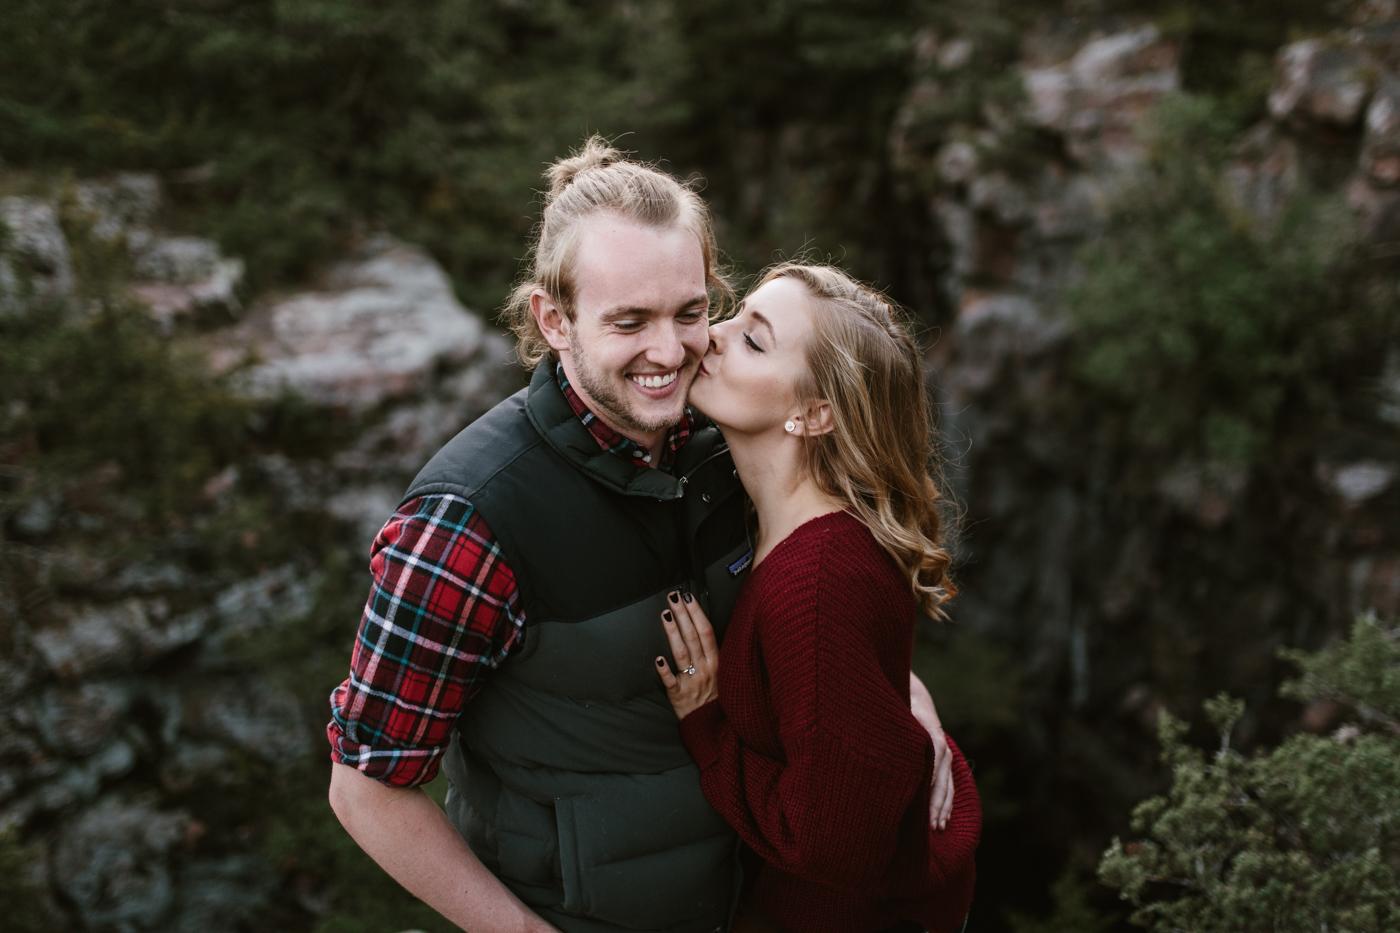 Sioux_Falls_Des_Moines_Engagement_Wedding_Photographer_52.jpg